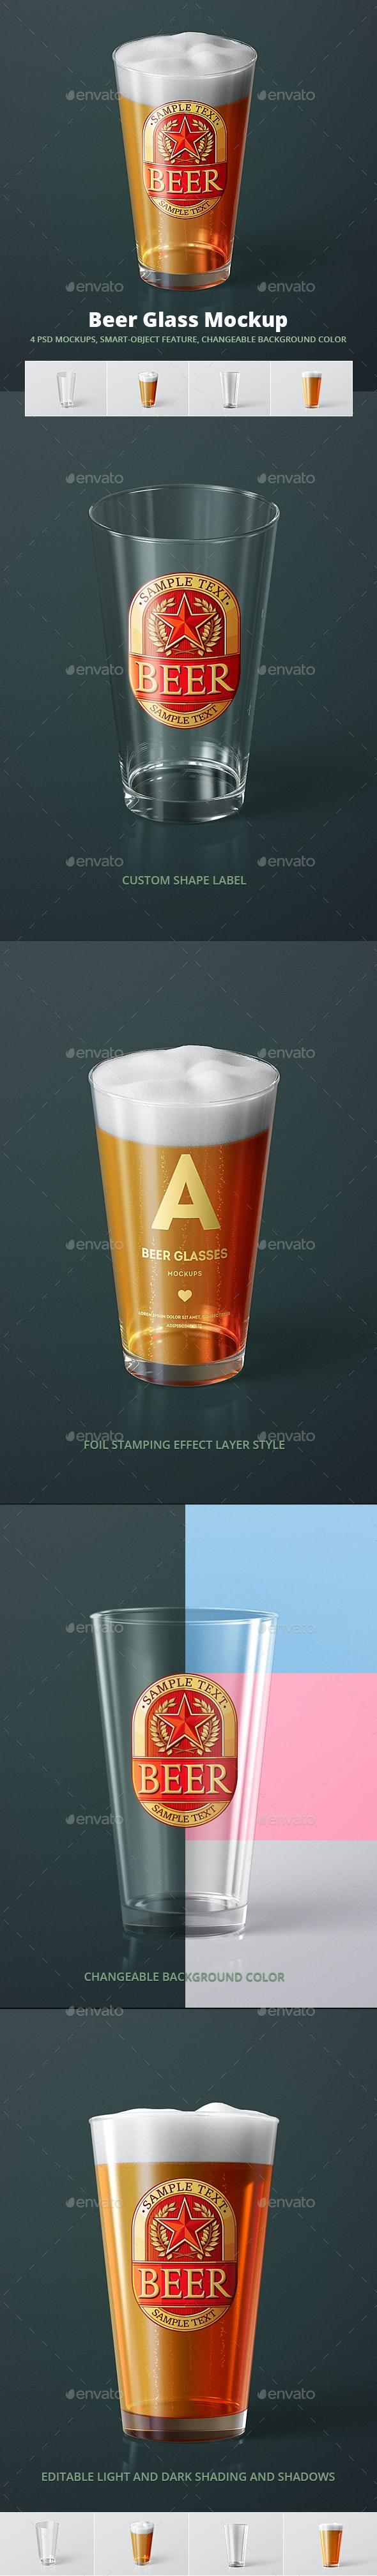 Beer Glass Mock-up - American Pint